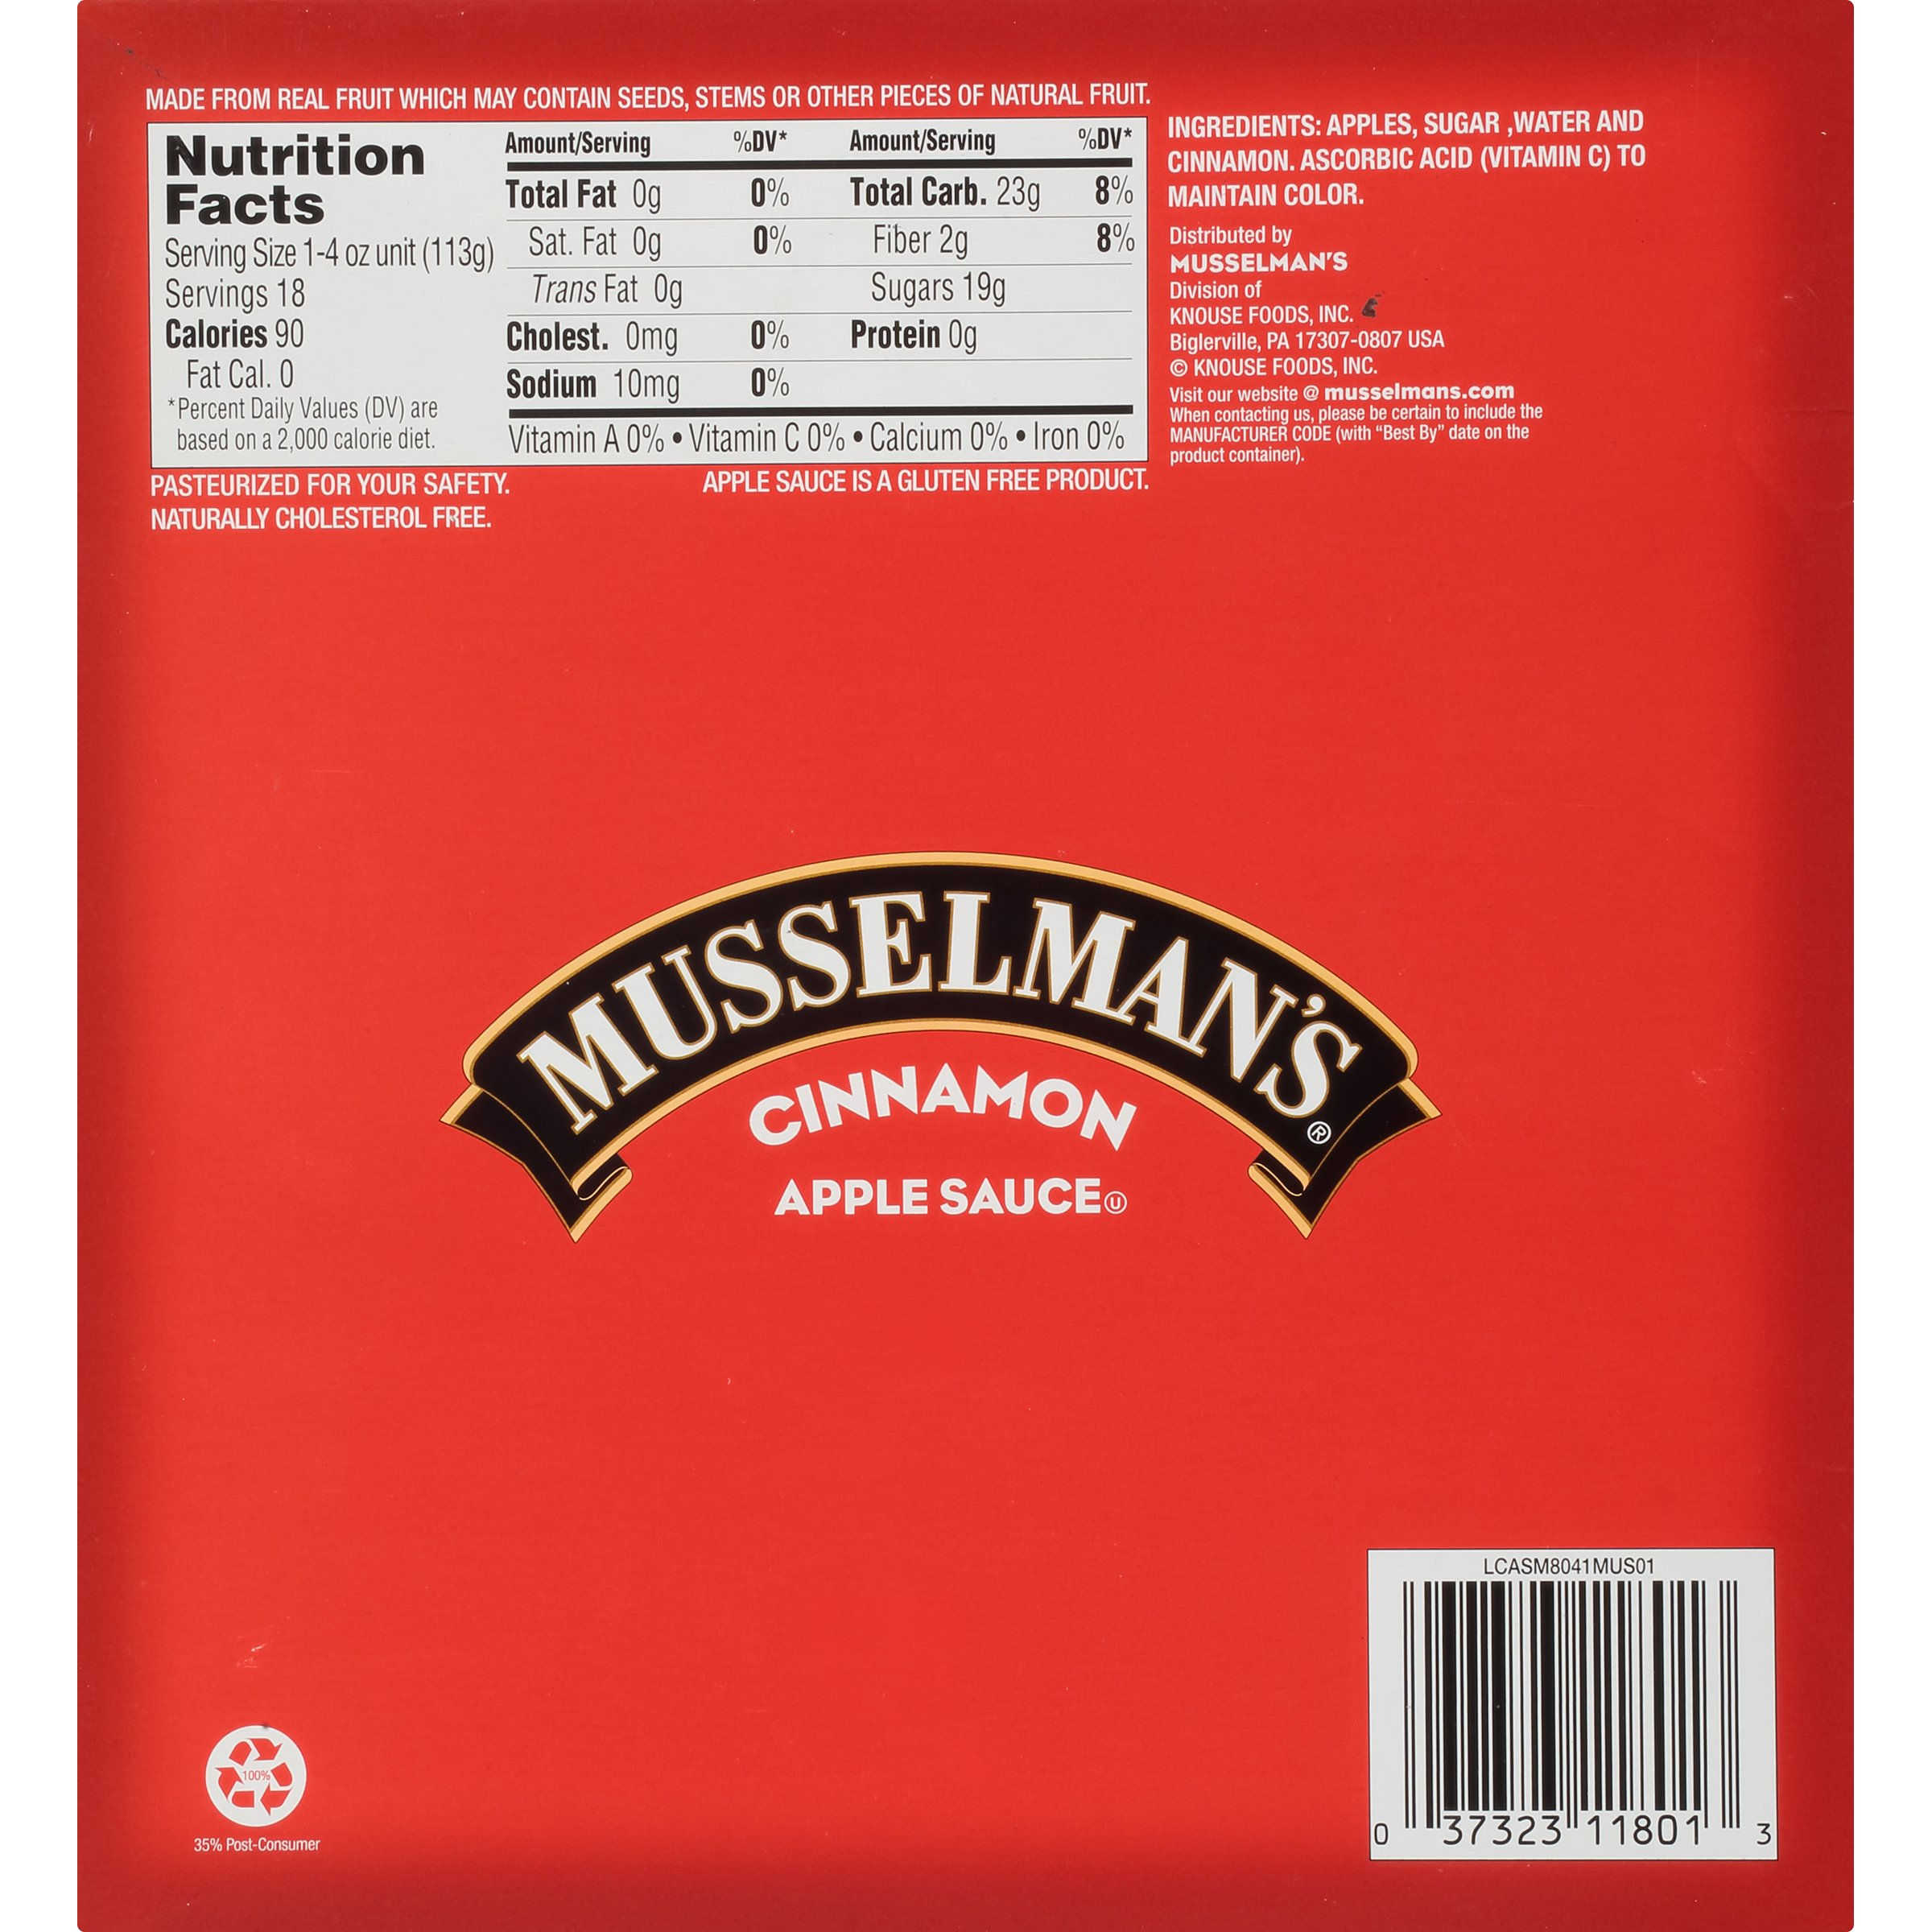 Musselman's Cinnamon Apple Sauce Cups, 4 Ounce by Musselmans (Image #2)